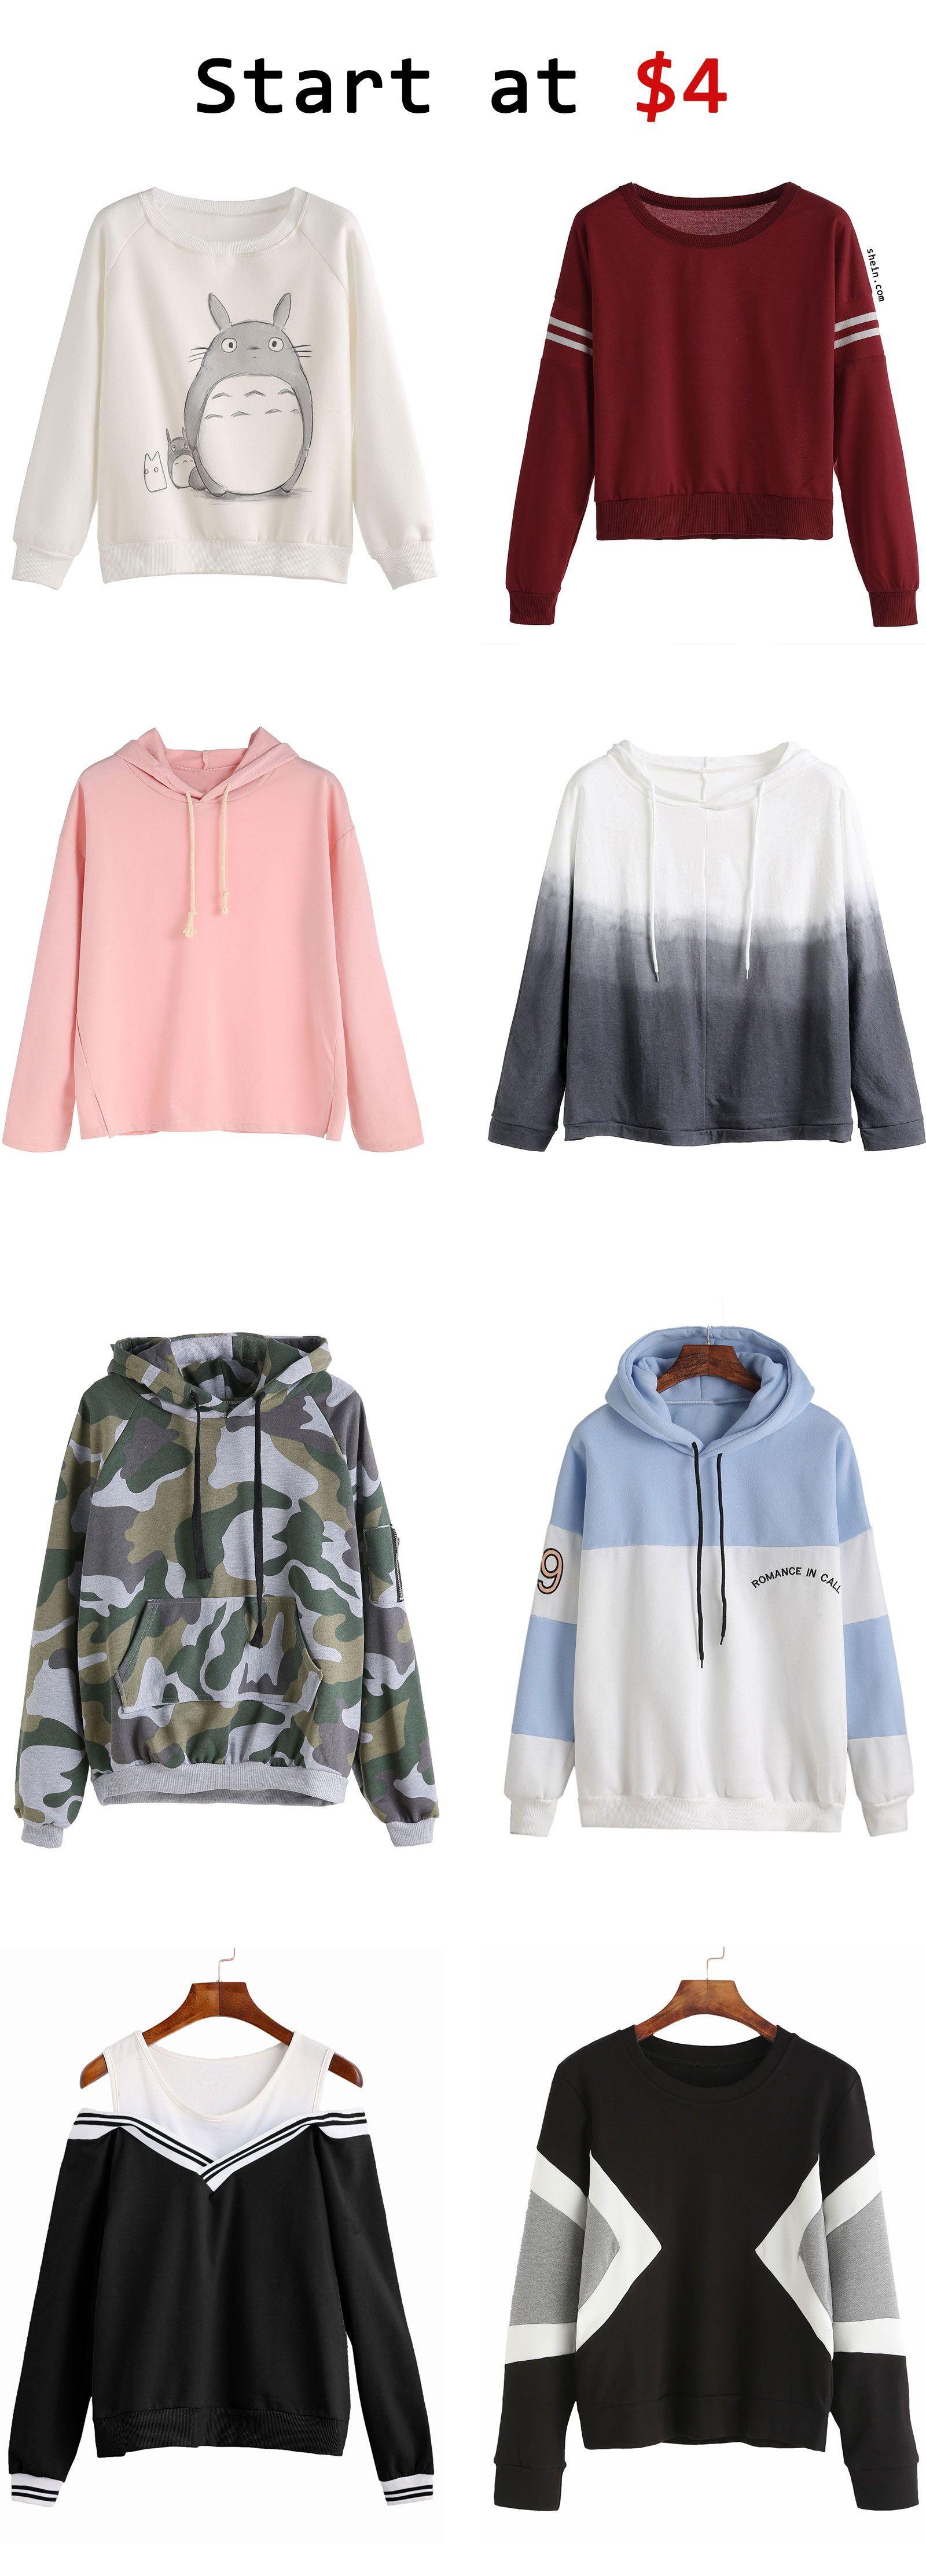 Sweatshirts start at $4